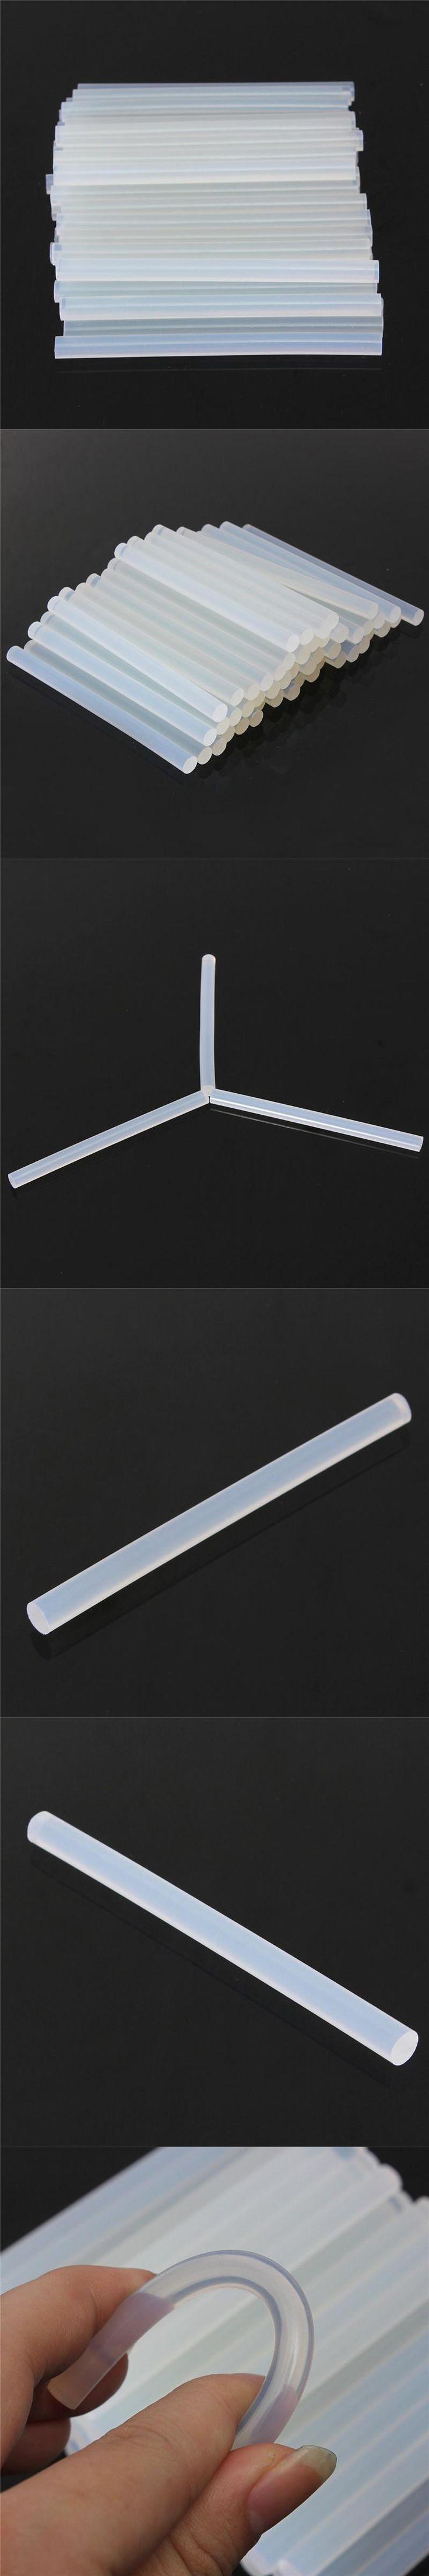 Hot Melt Glue sticks 7mmx100mm Clear Glue Adhesive Sticks For for Glue Car Audio Craft Alloy Accessories  10 Pcs Per Set